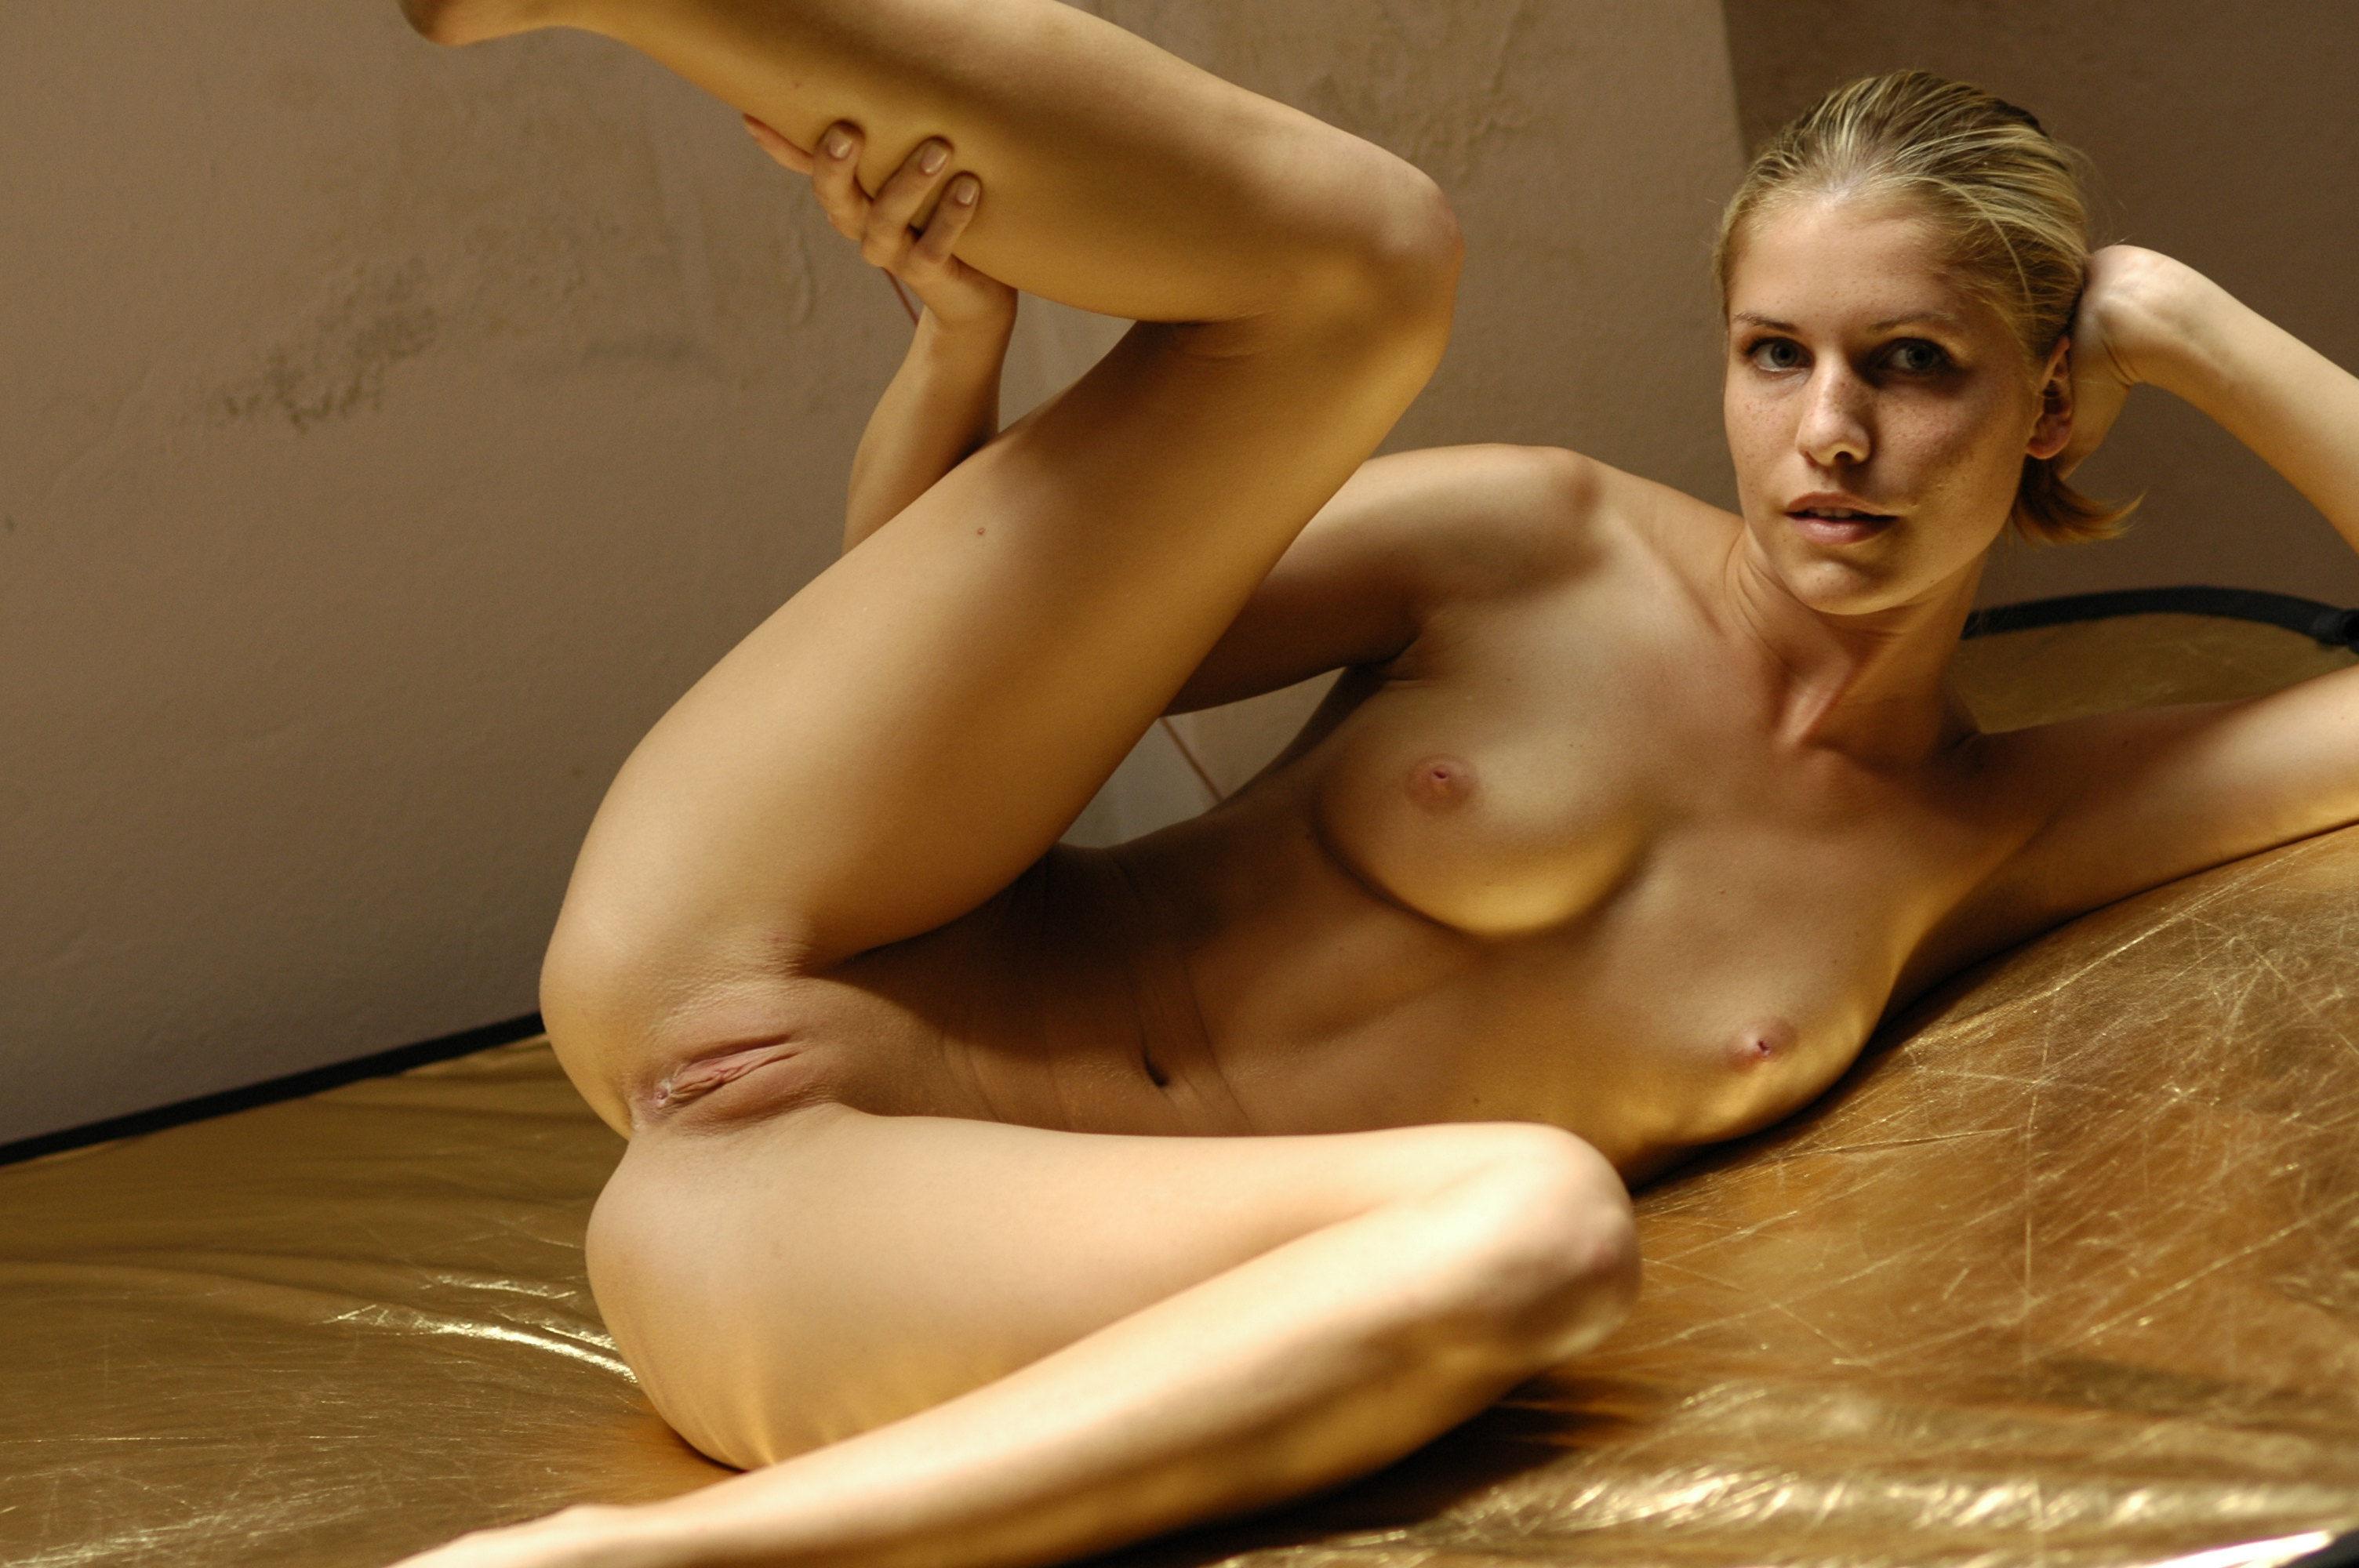 women nake in bed